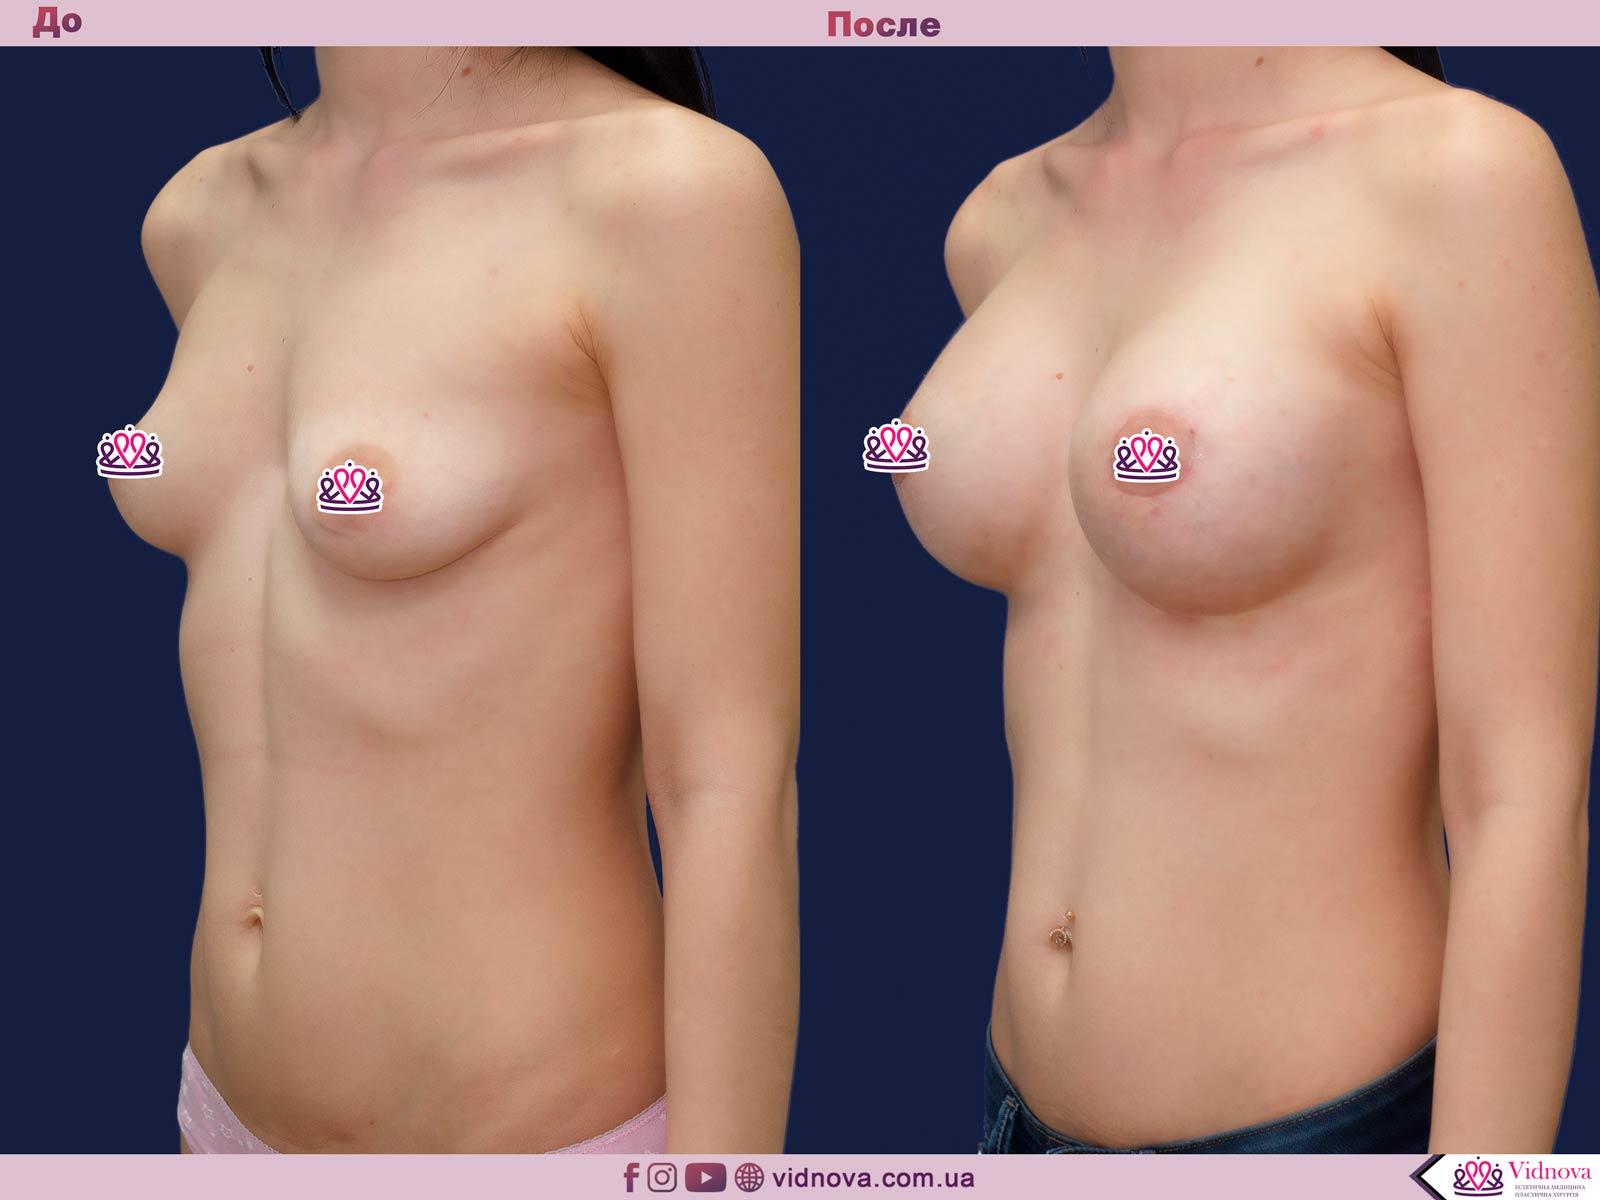 Подтяжка груди: Фото ДО и ПОСЛЕ - Пример №23-2 - Клиника Vidnova